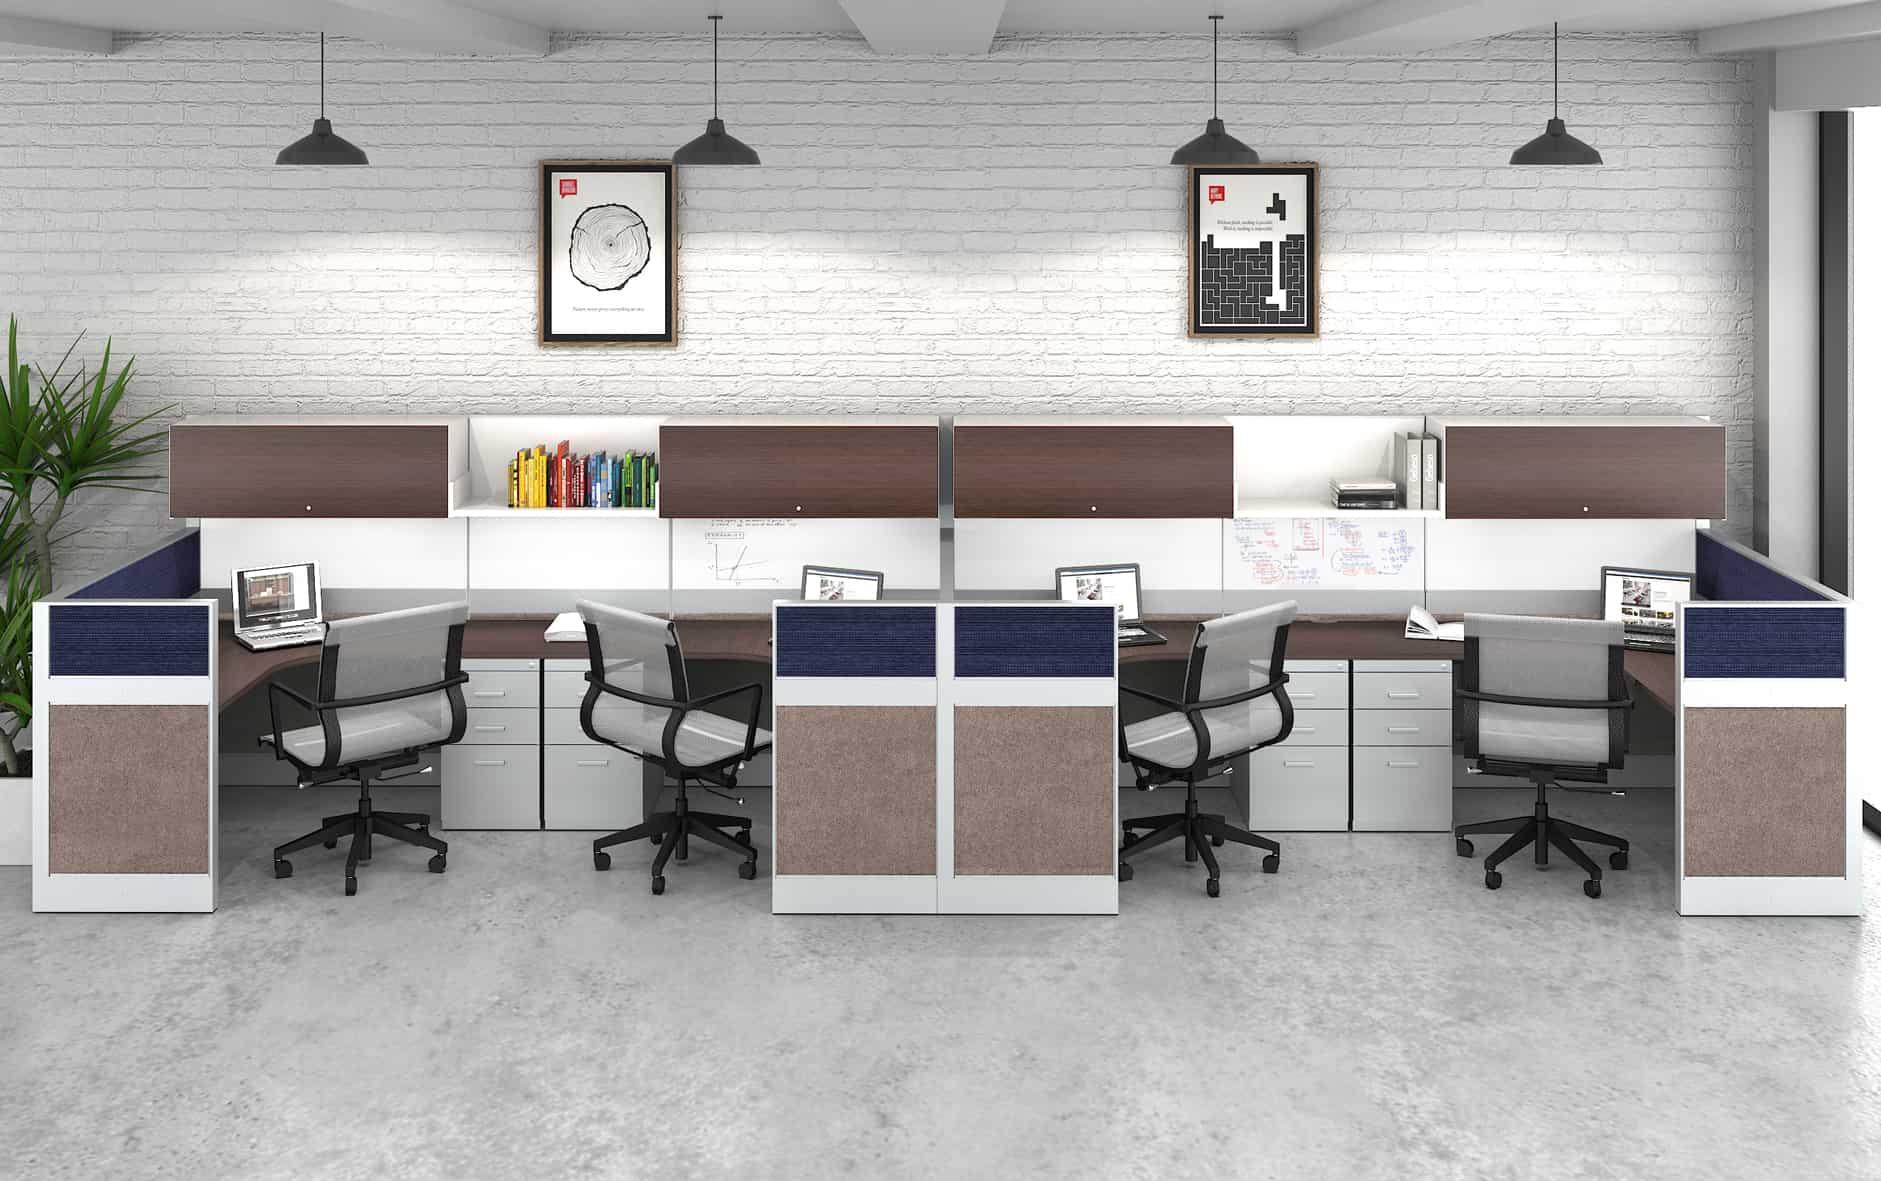 mobiliario-para-espacios-de-oficina-colaborativos